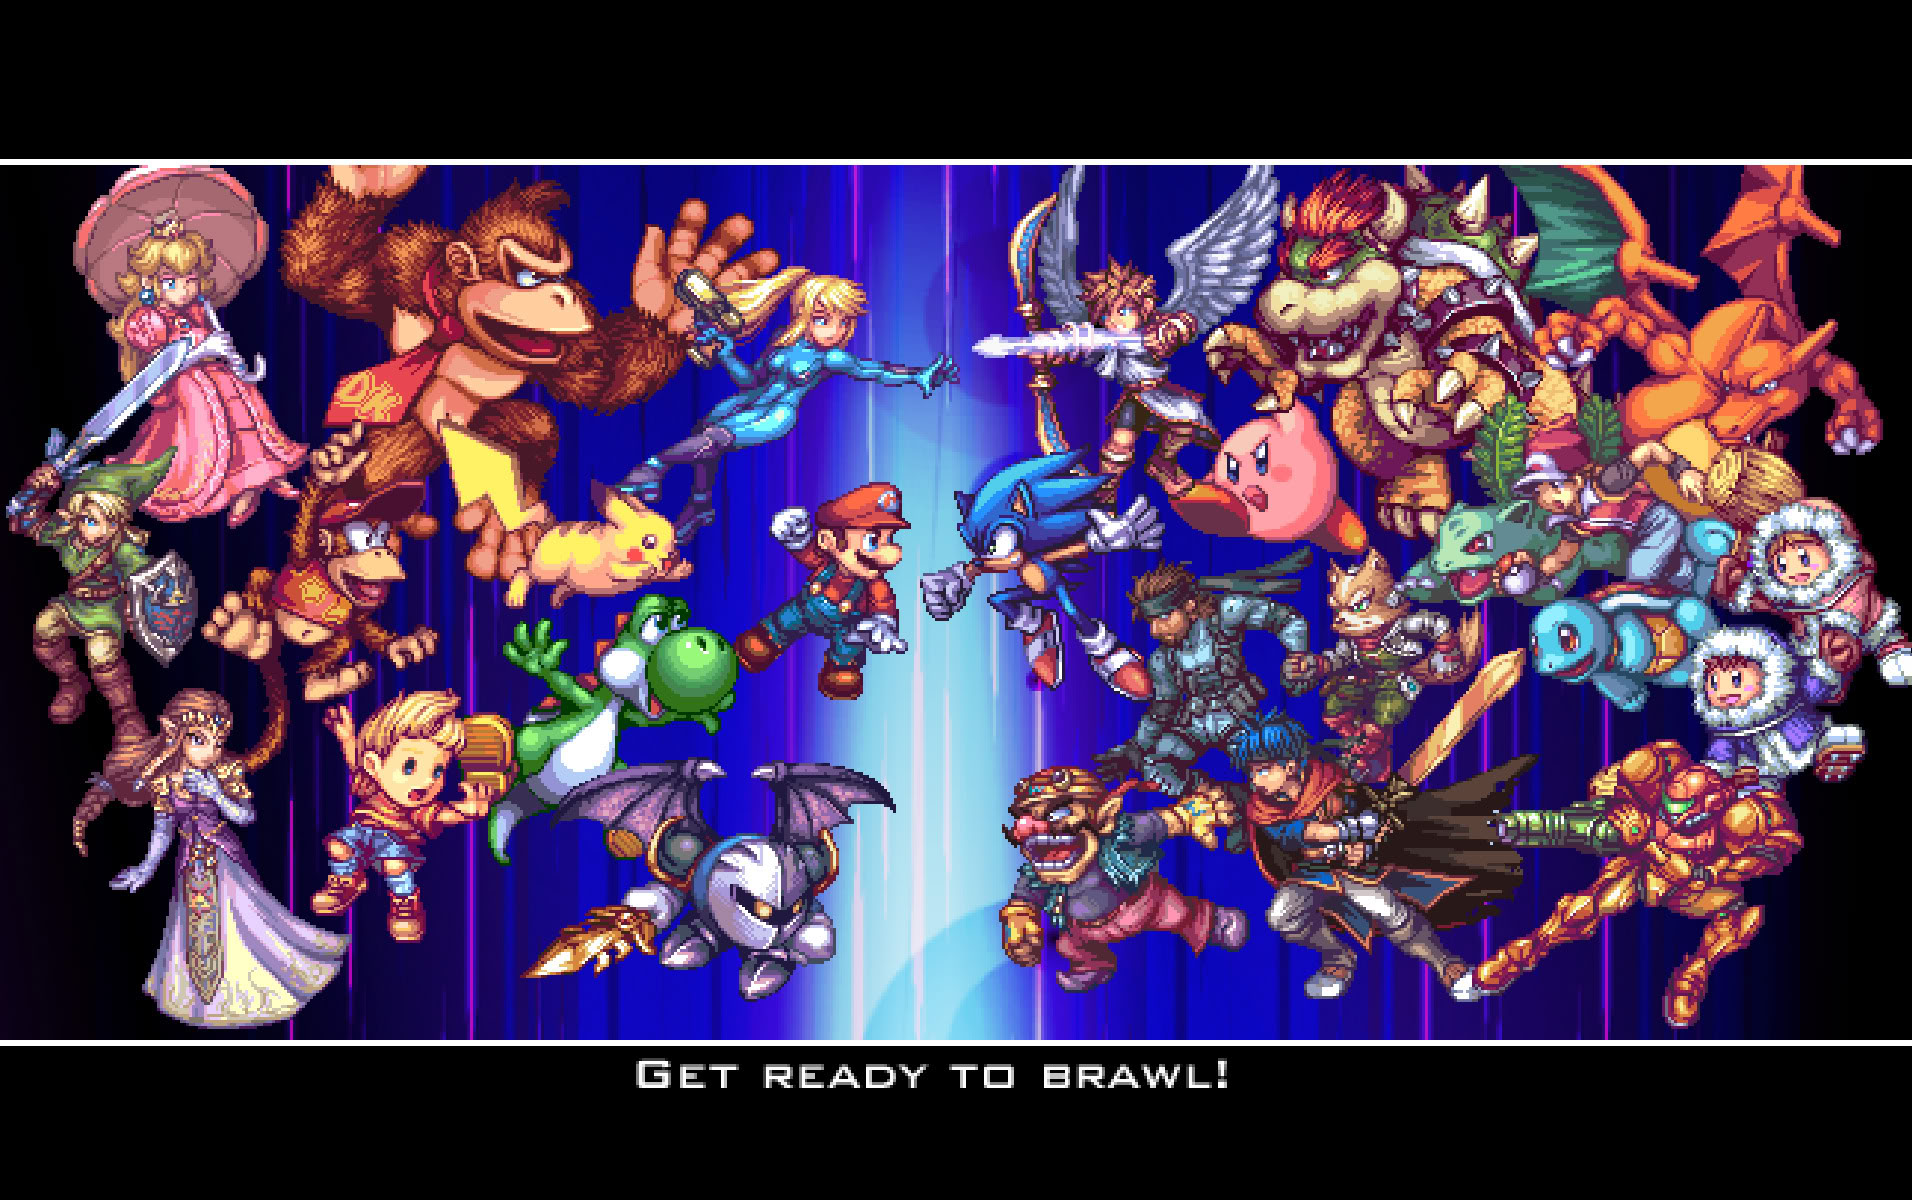 Super Smash Bros Brawl Wallpaper Posted By John Tremblay